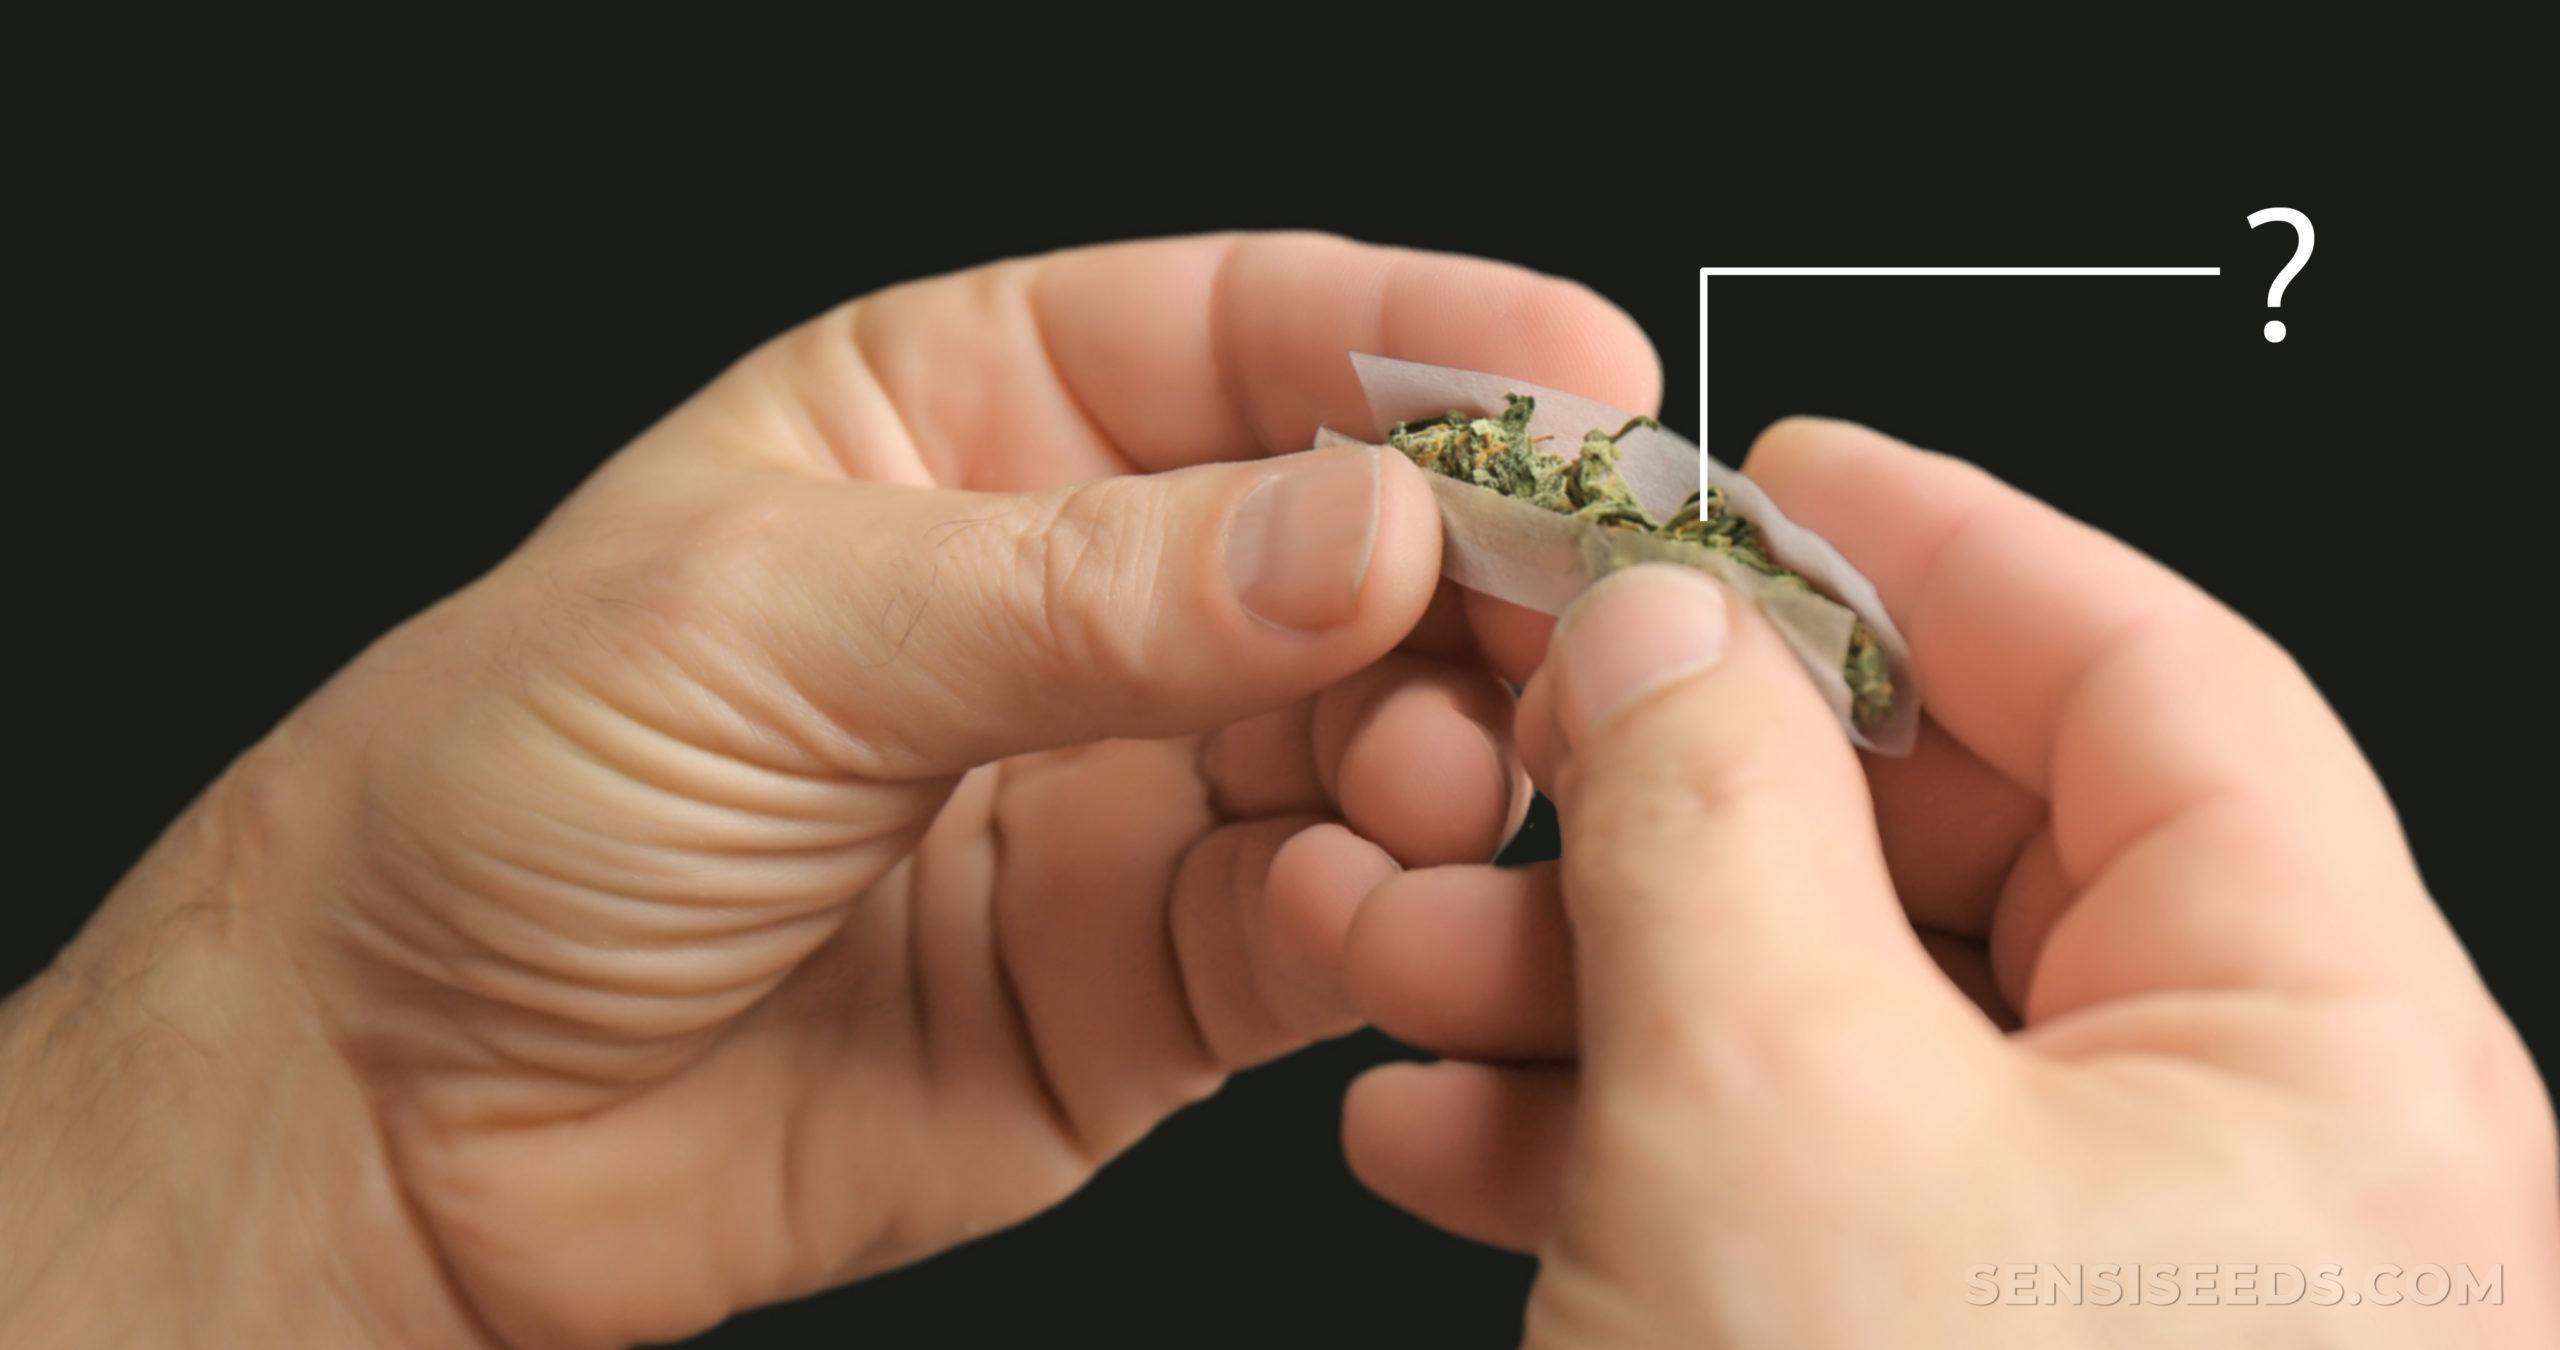 Many-deaths-attributable-cannabis-scaled